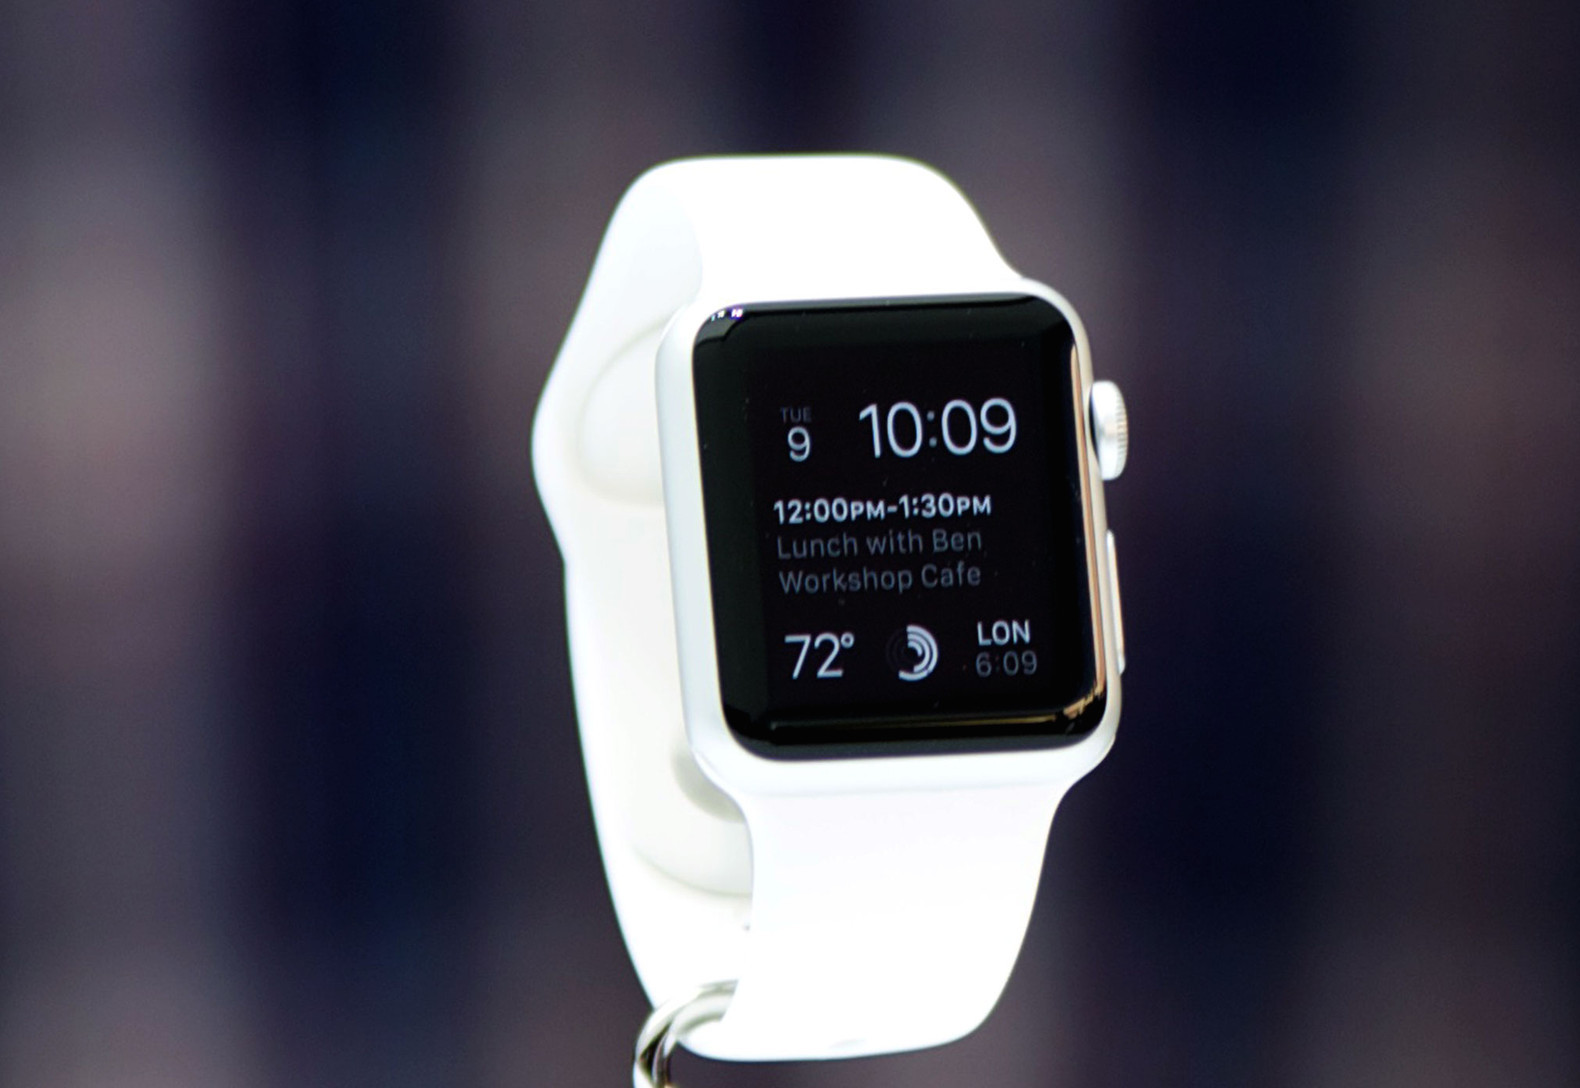 Apple Watch перемололи в блендере (ВИДЕО)